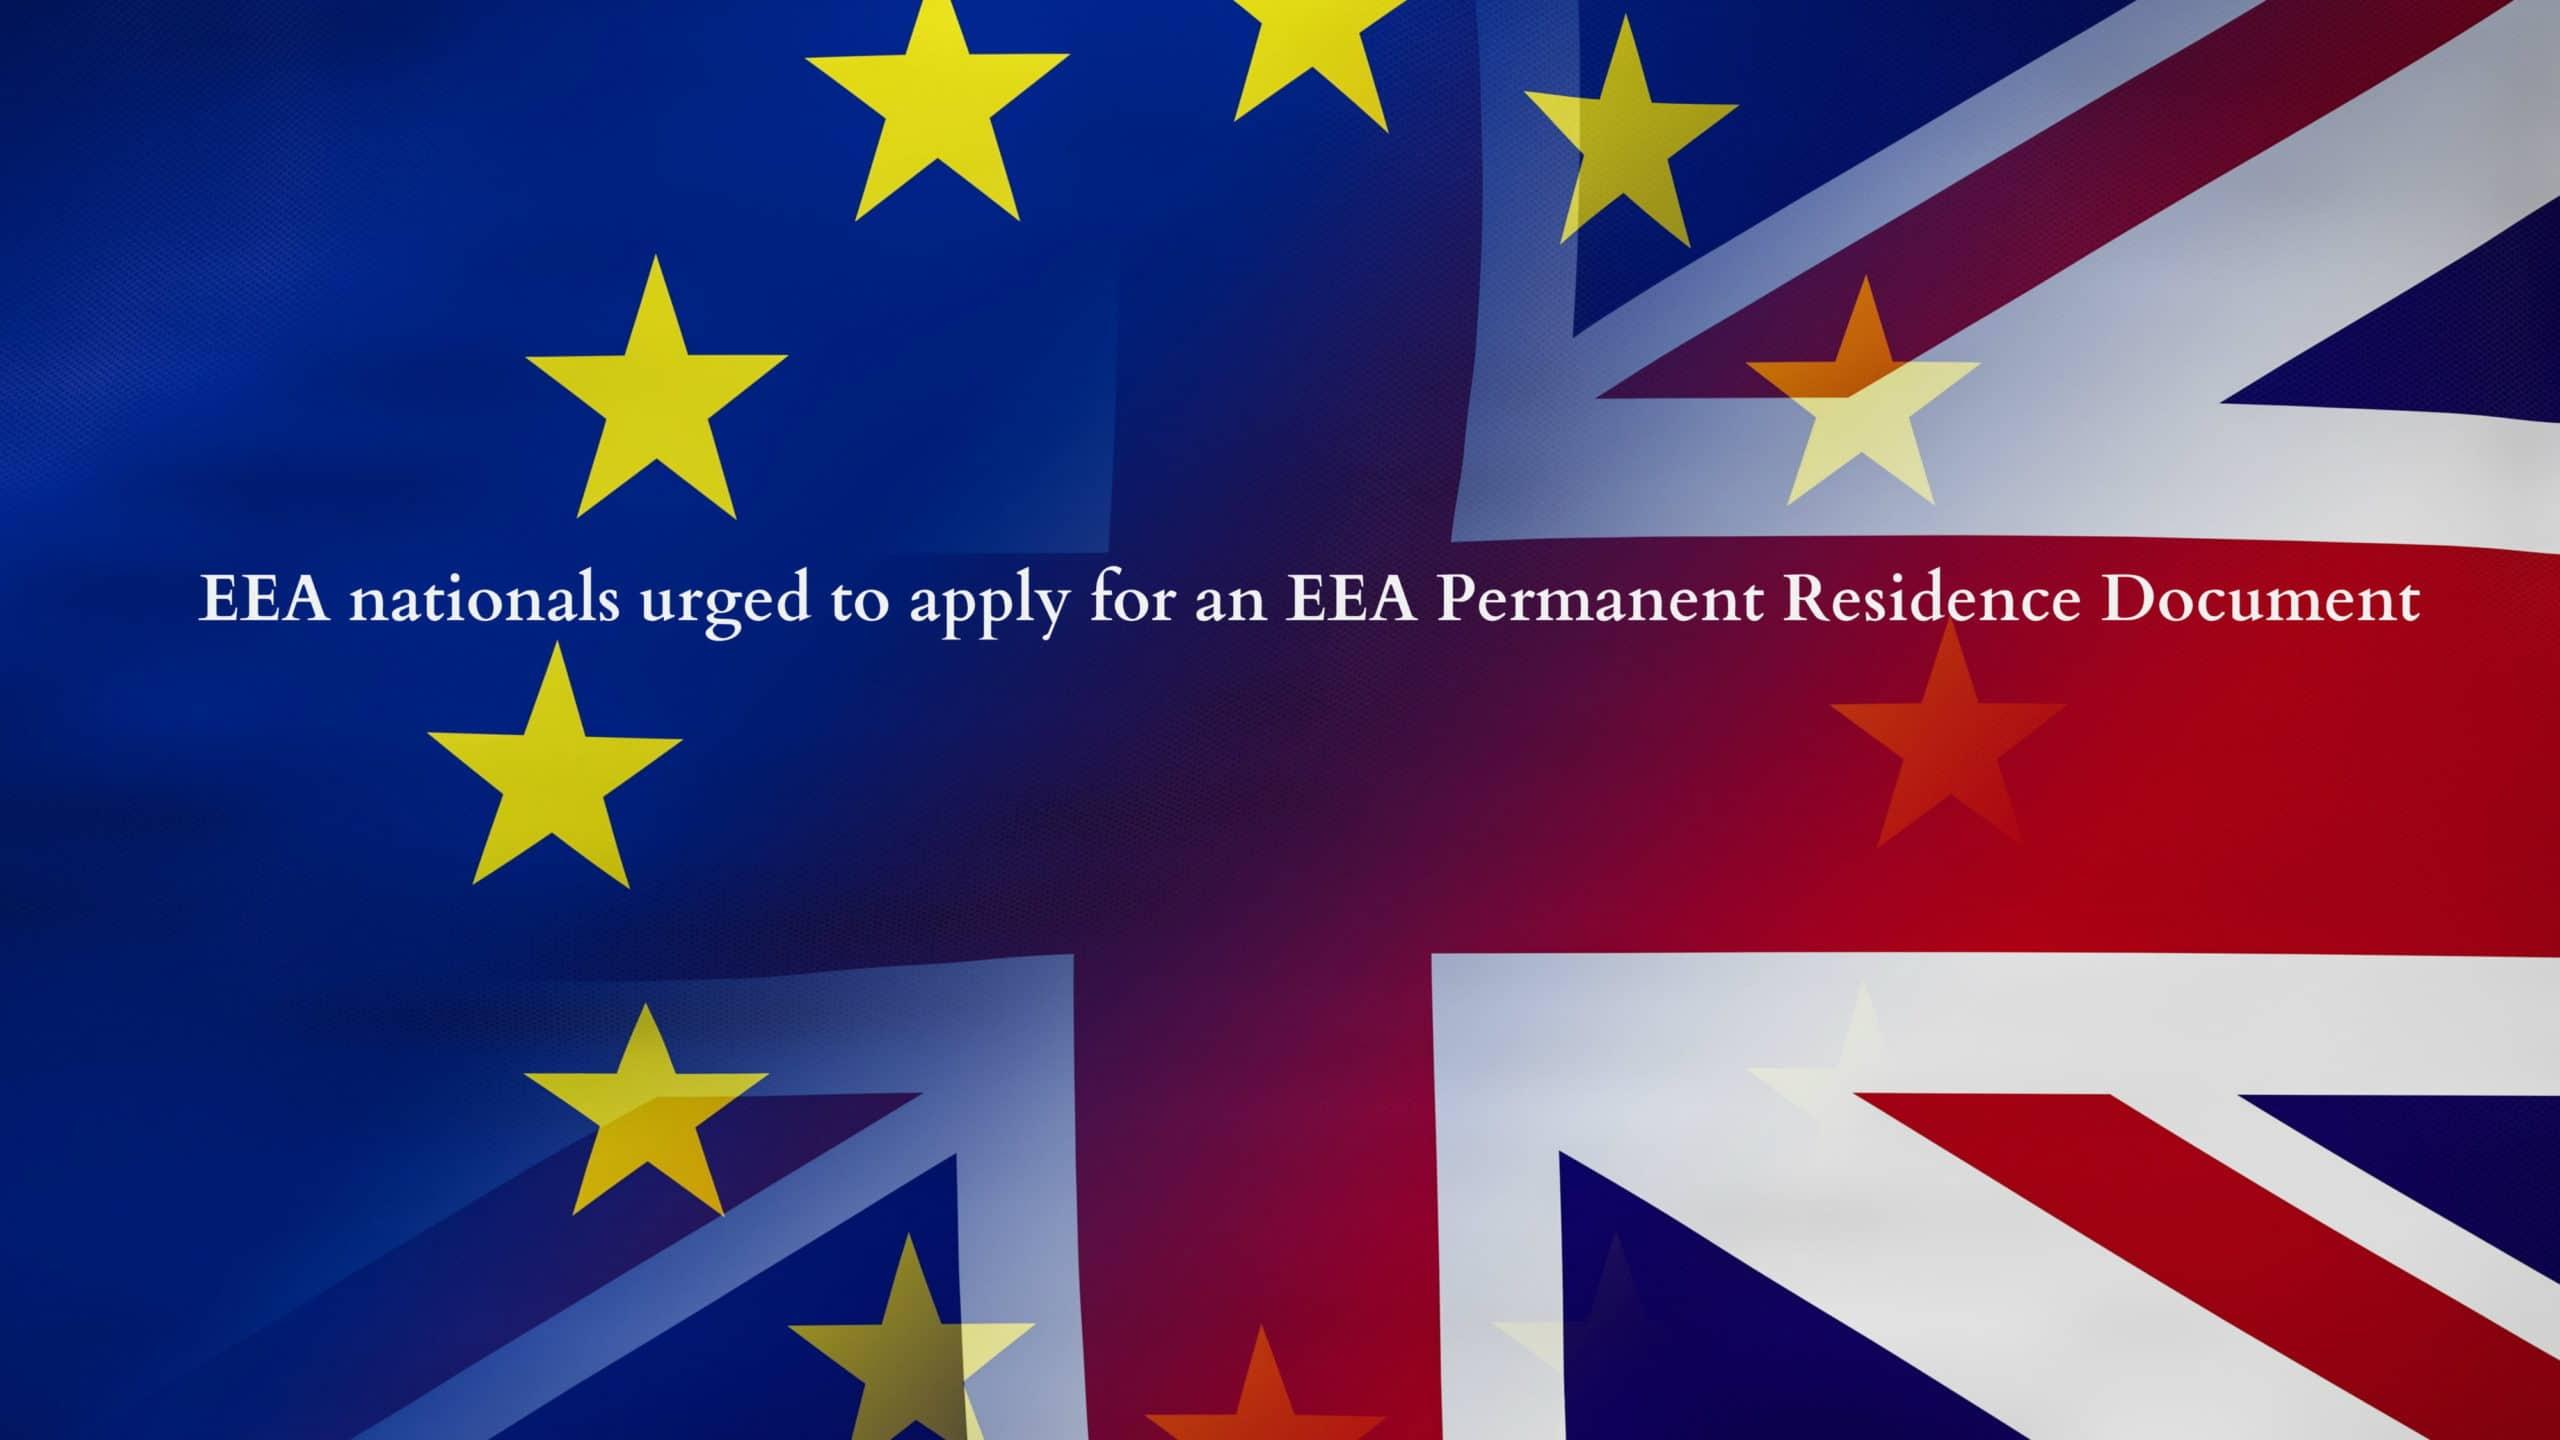 EEA Permanent Residence Document